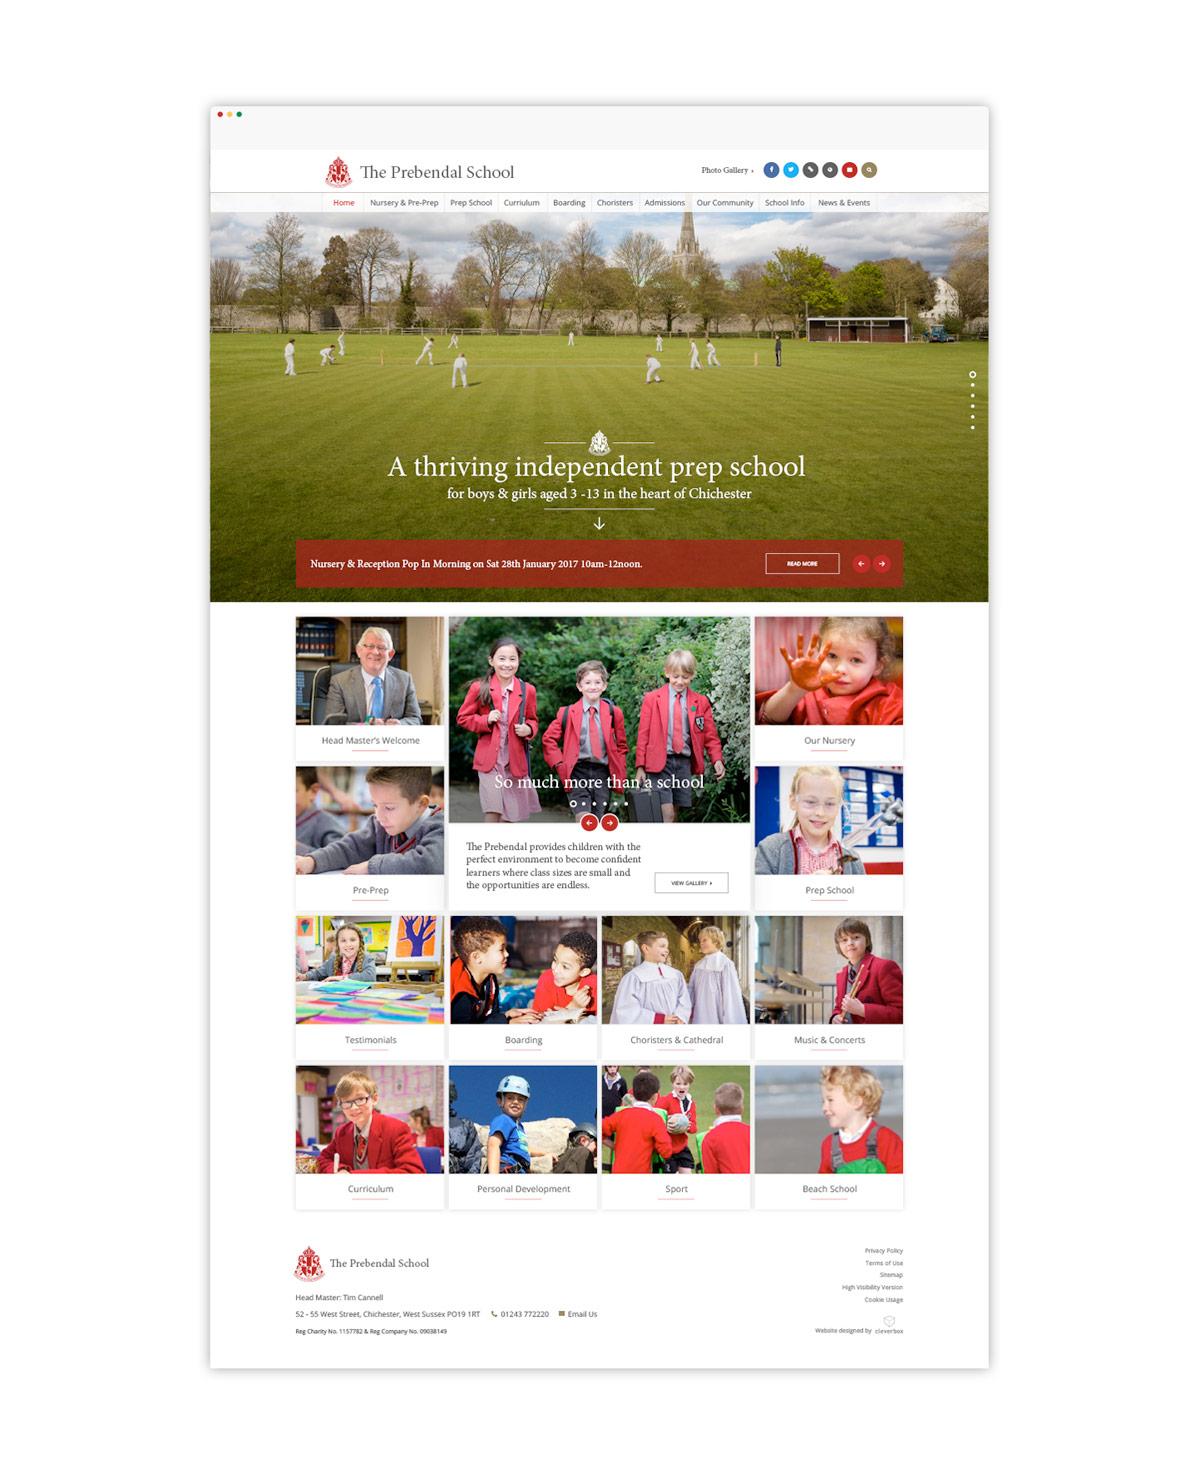 prebendal school website homepage design mockup